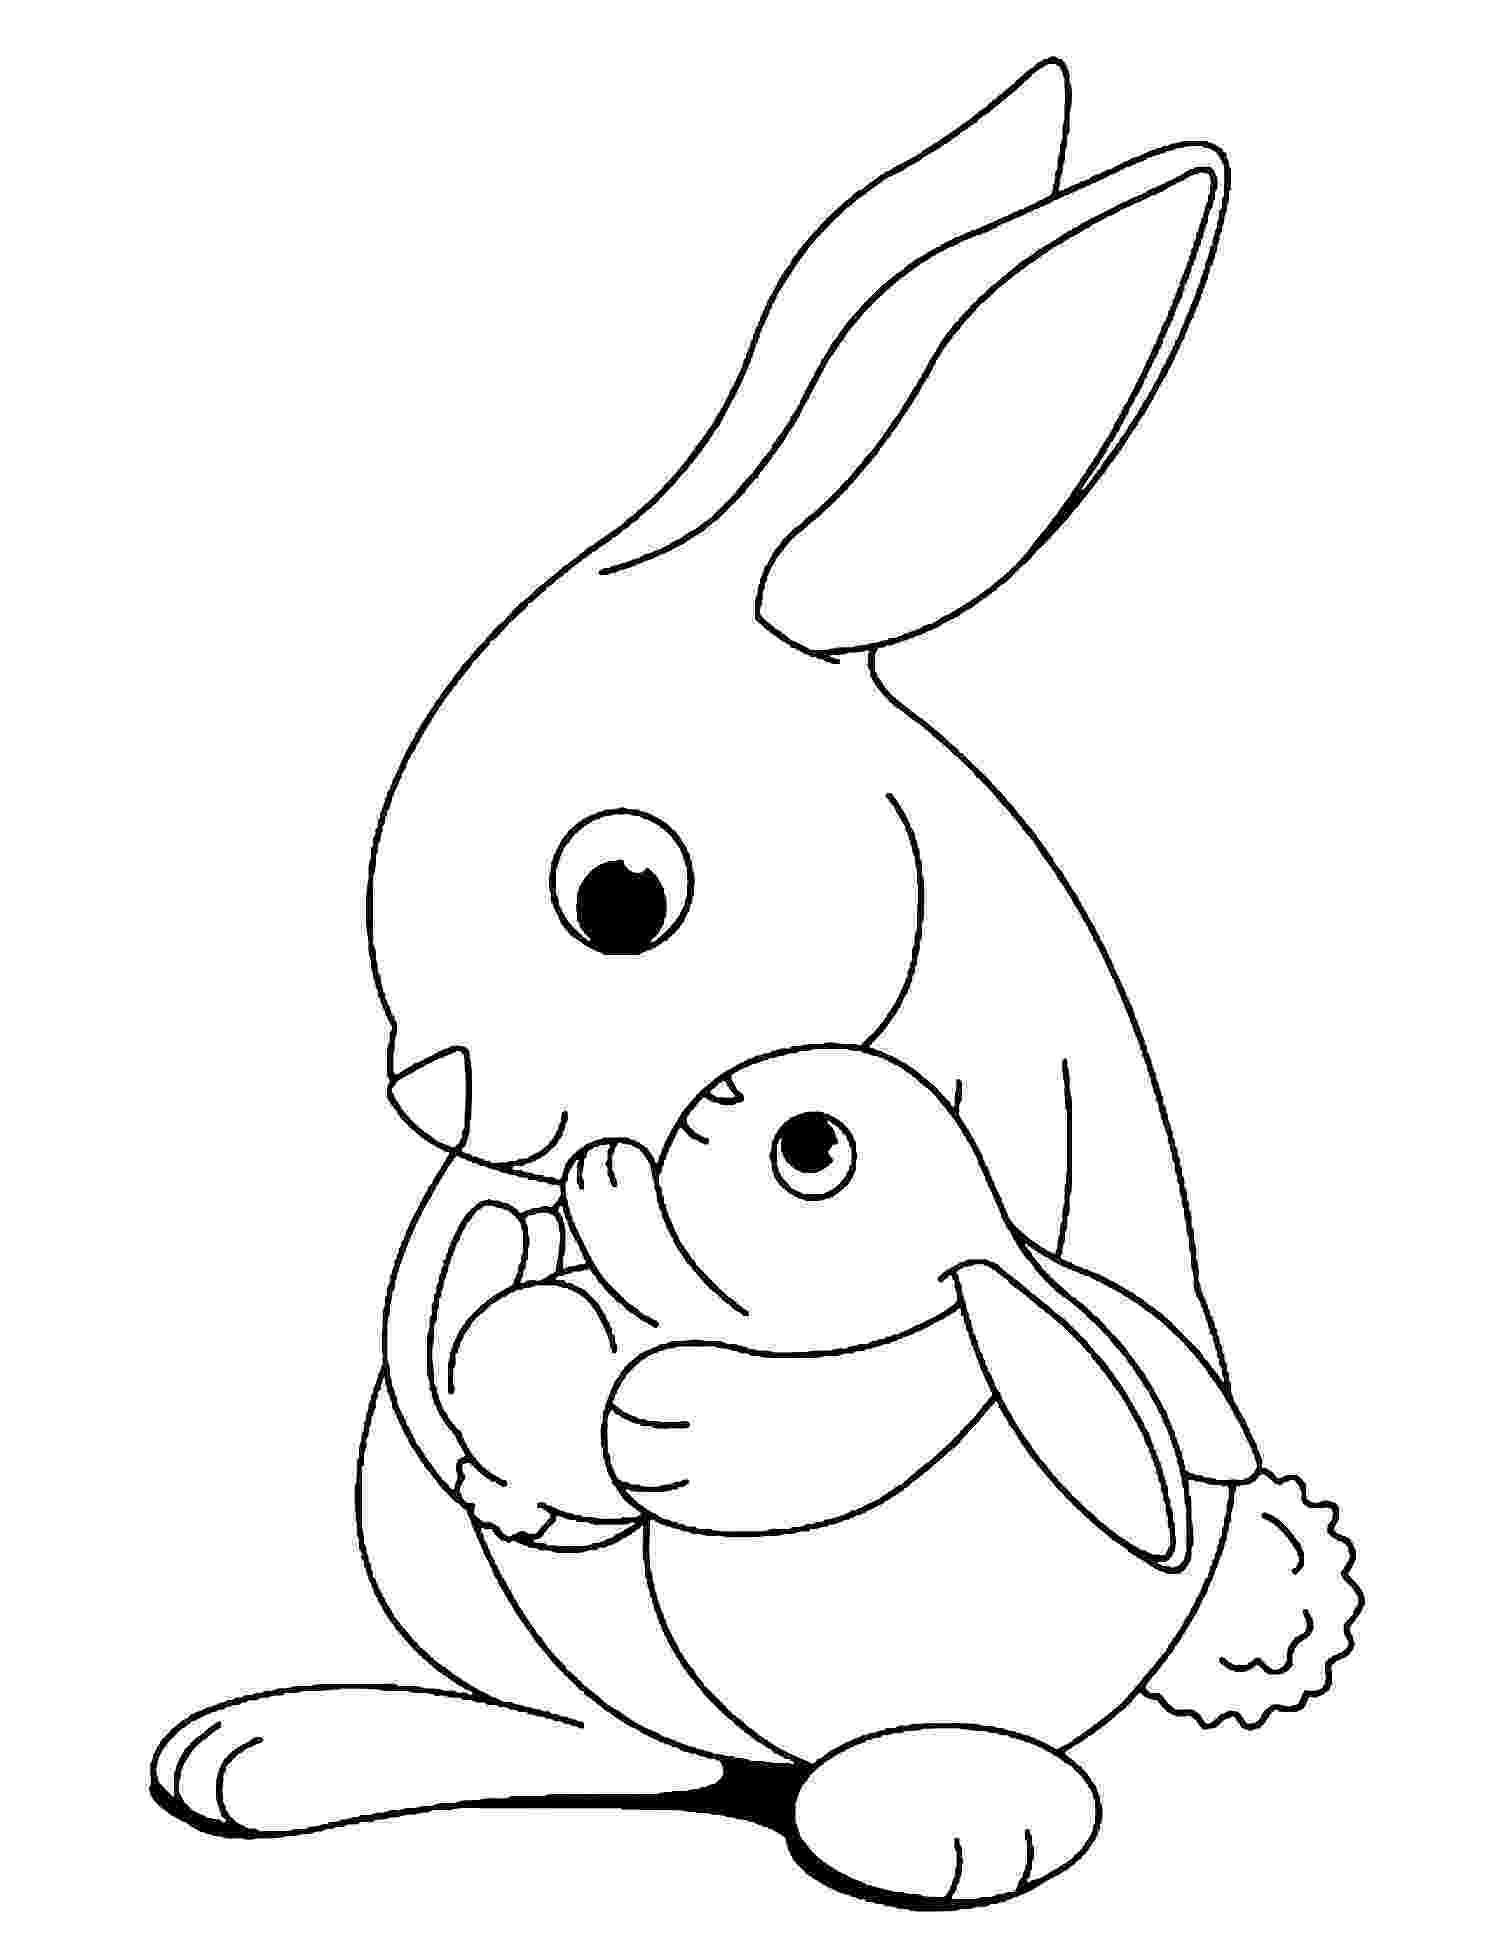 printable coloring rabbit printable rabbit coloring pages for kids cool2bkids coloring printable rabbit